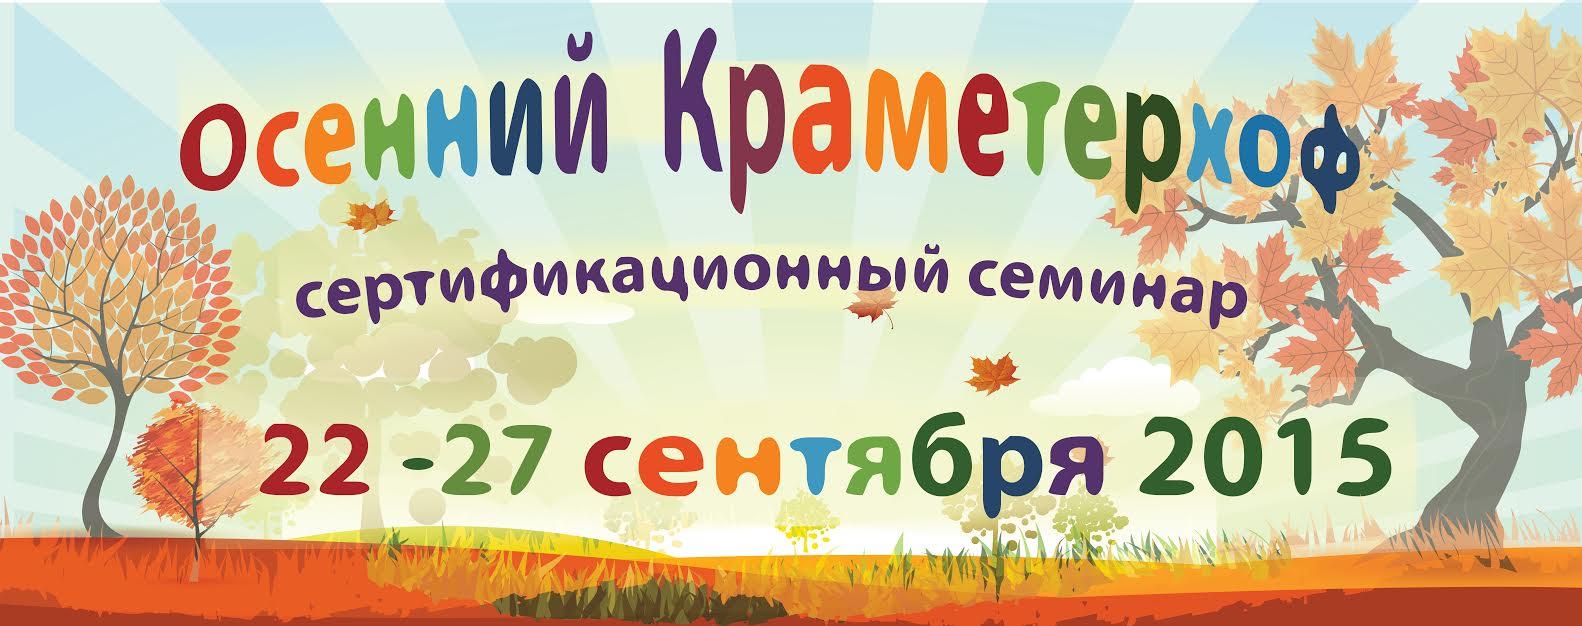 Баннер Краметрехоф